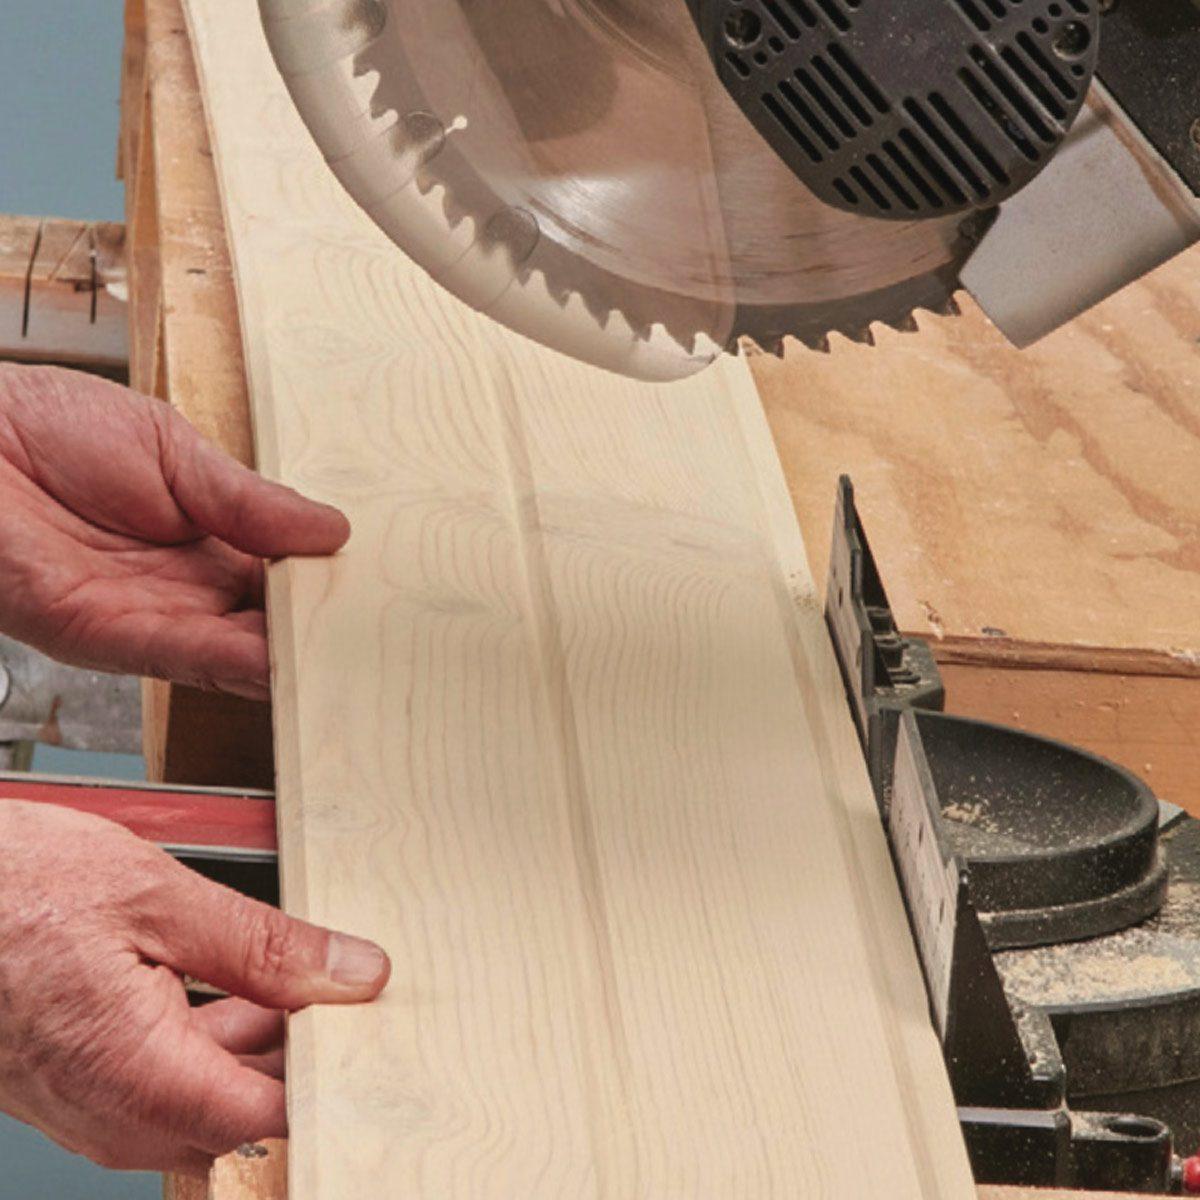 Cut problem boards shorter